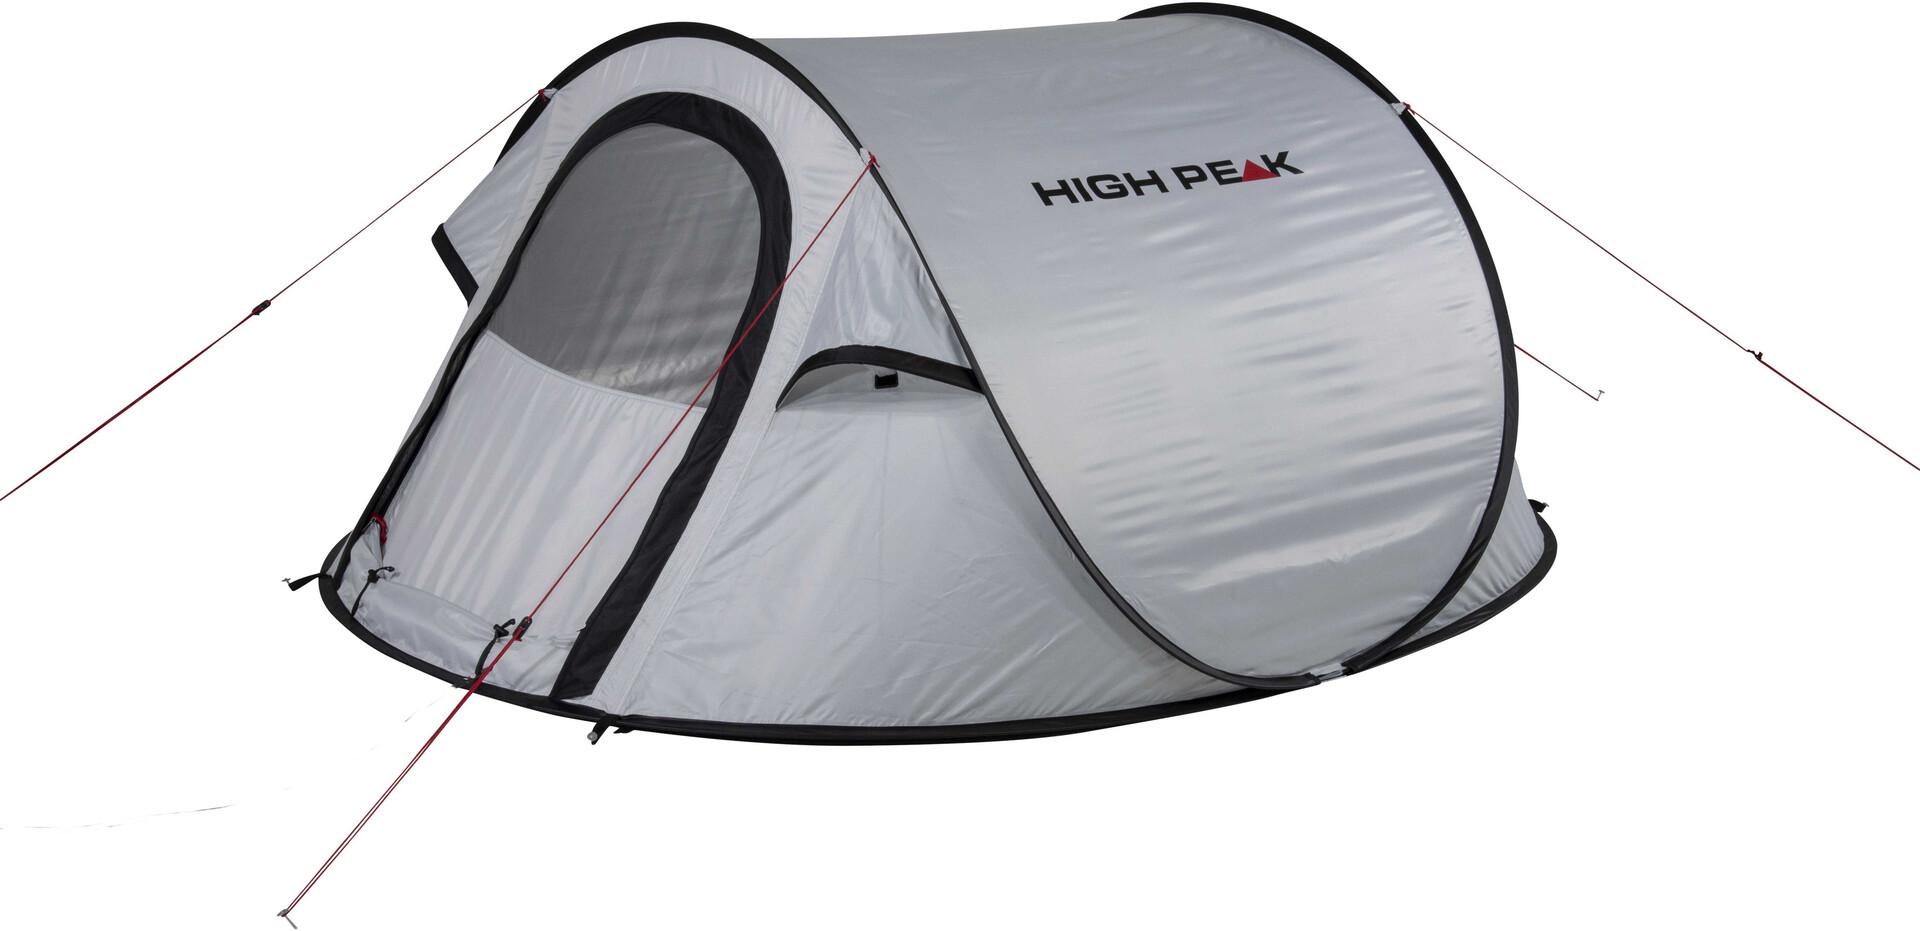 High Peak Vision 2 Tent, pearl l Online outdoor shop Campz.nl